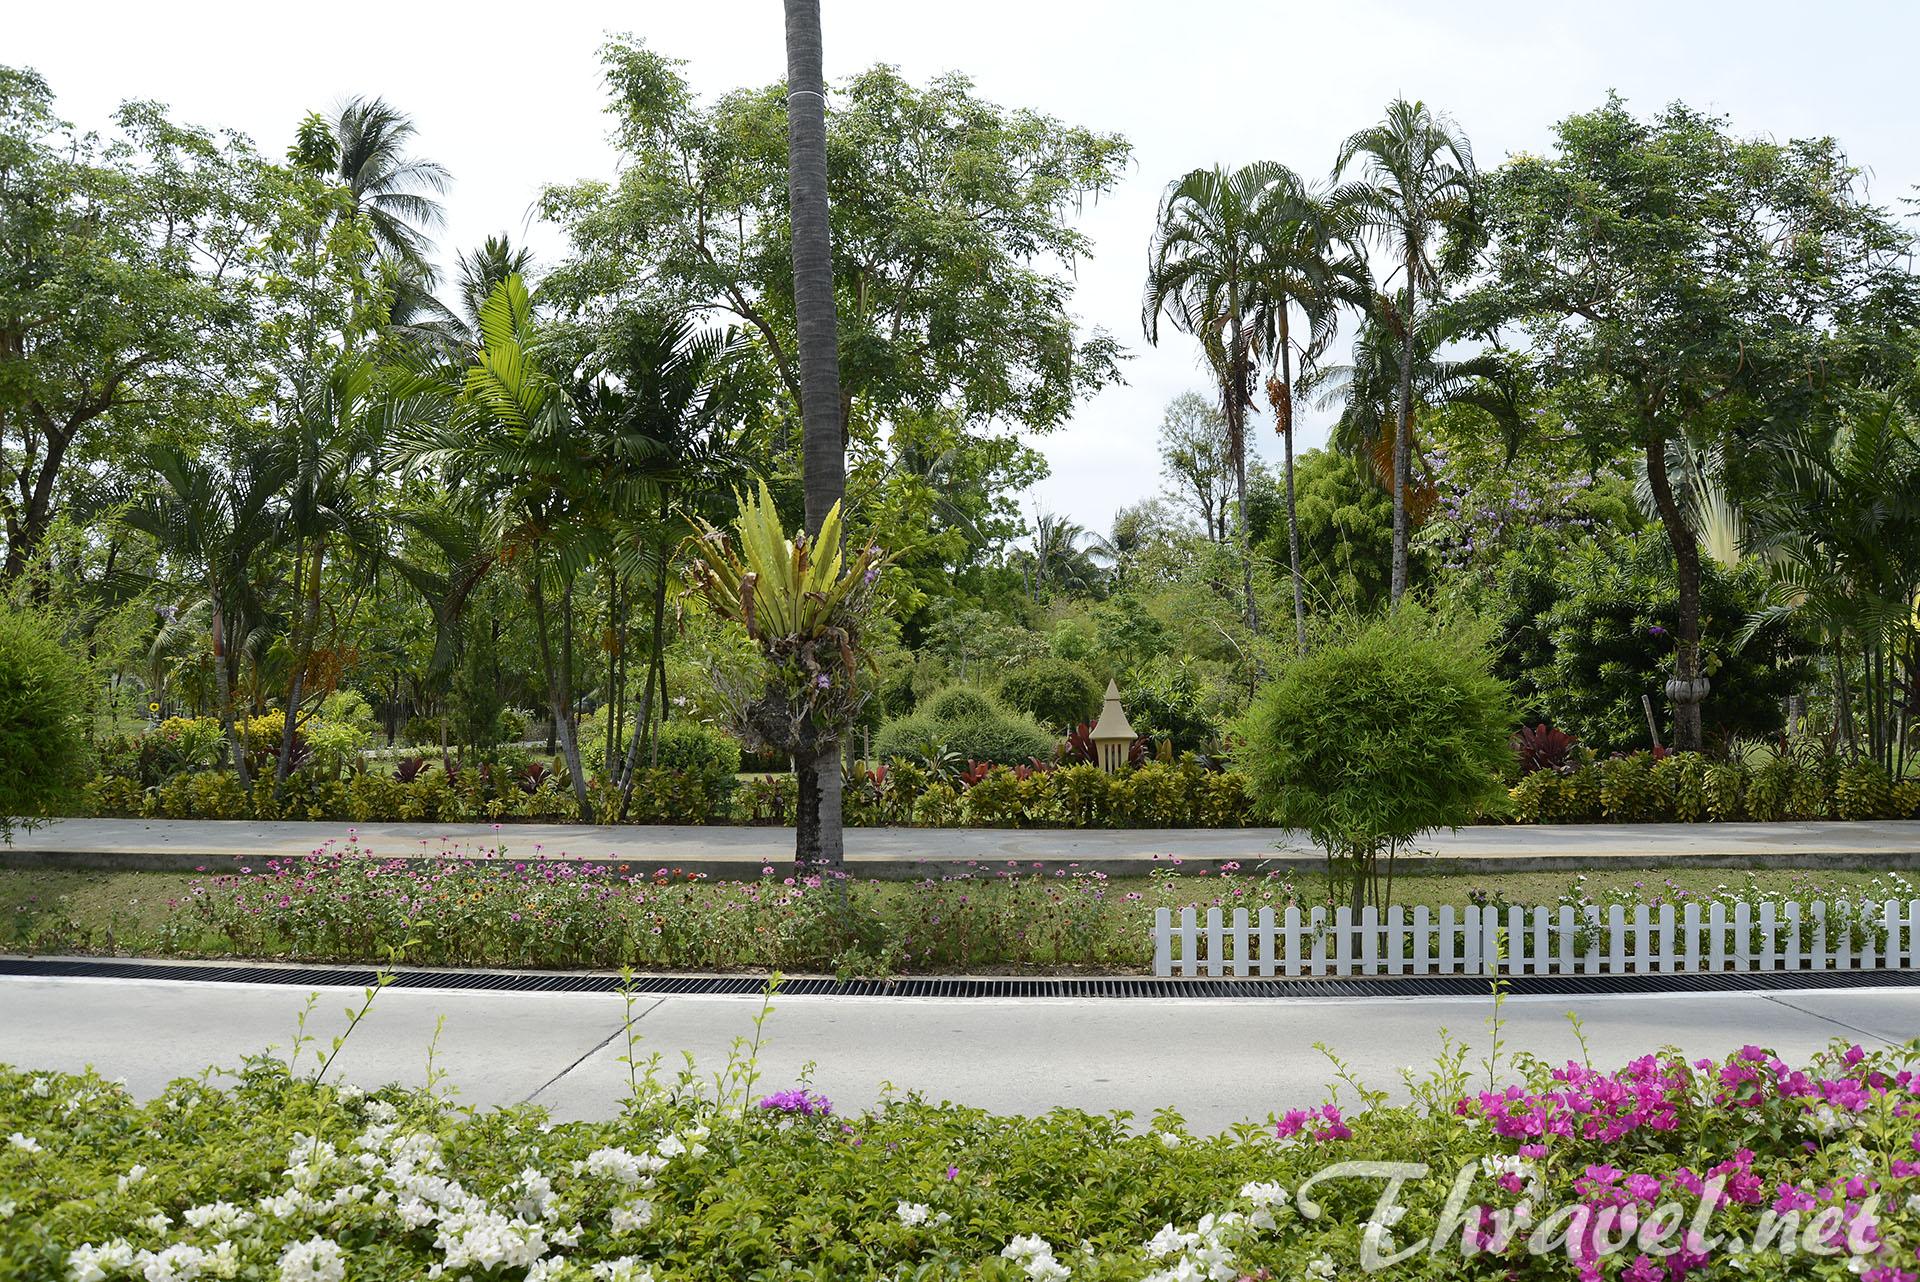 duangjitt-resort-and-spa-hotel-patong-beach-phuket-thailand-05